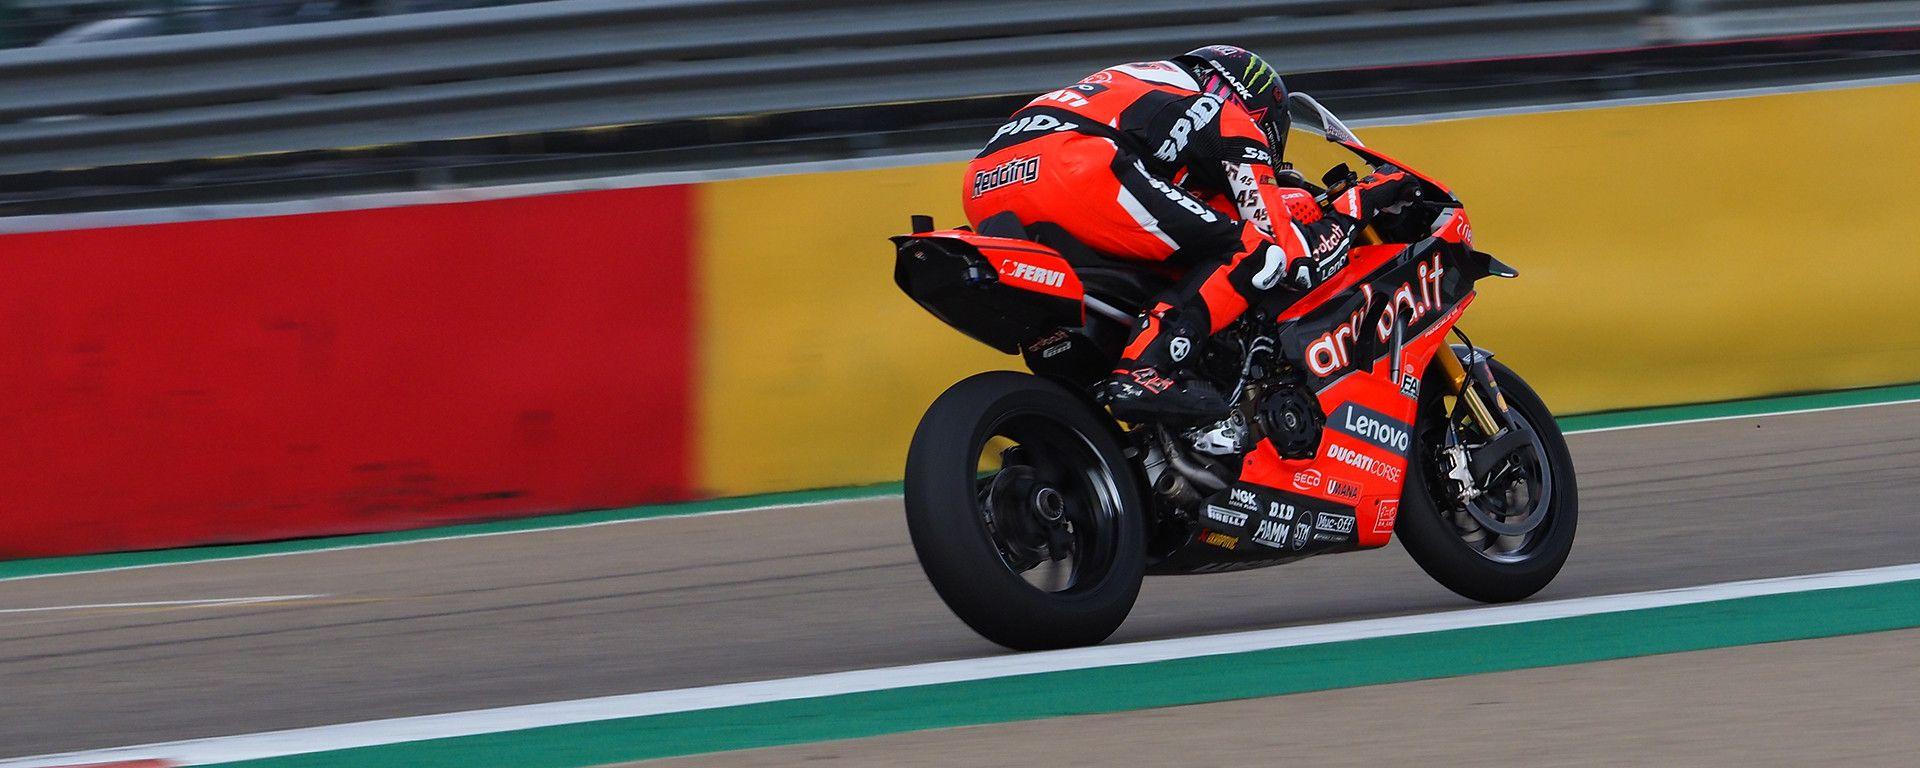 Superbike Aragon 2020: Scott Redding (Ducati)